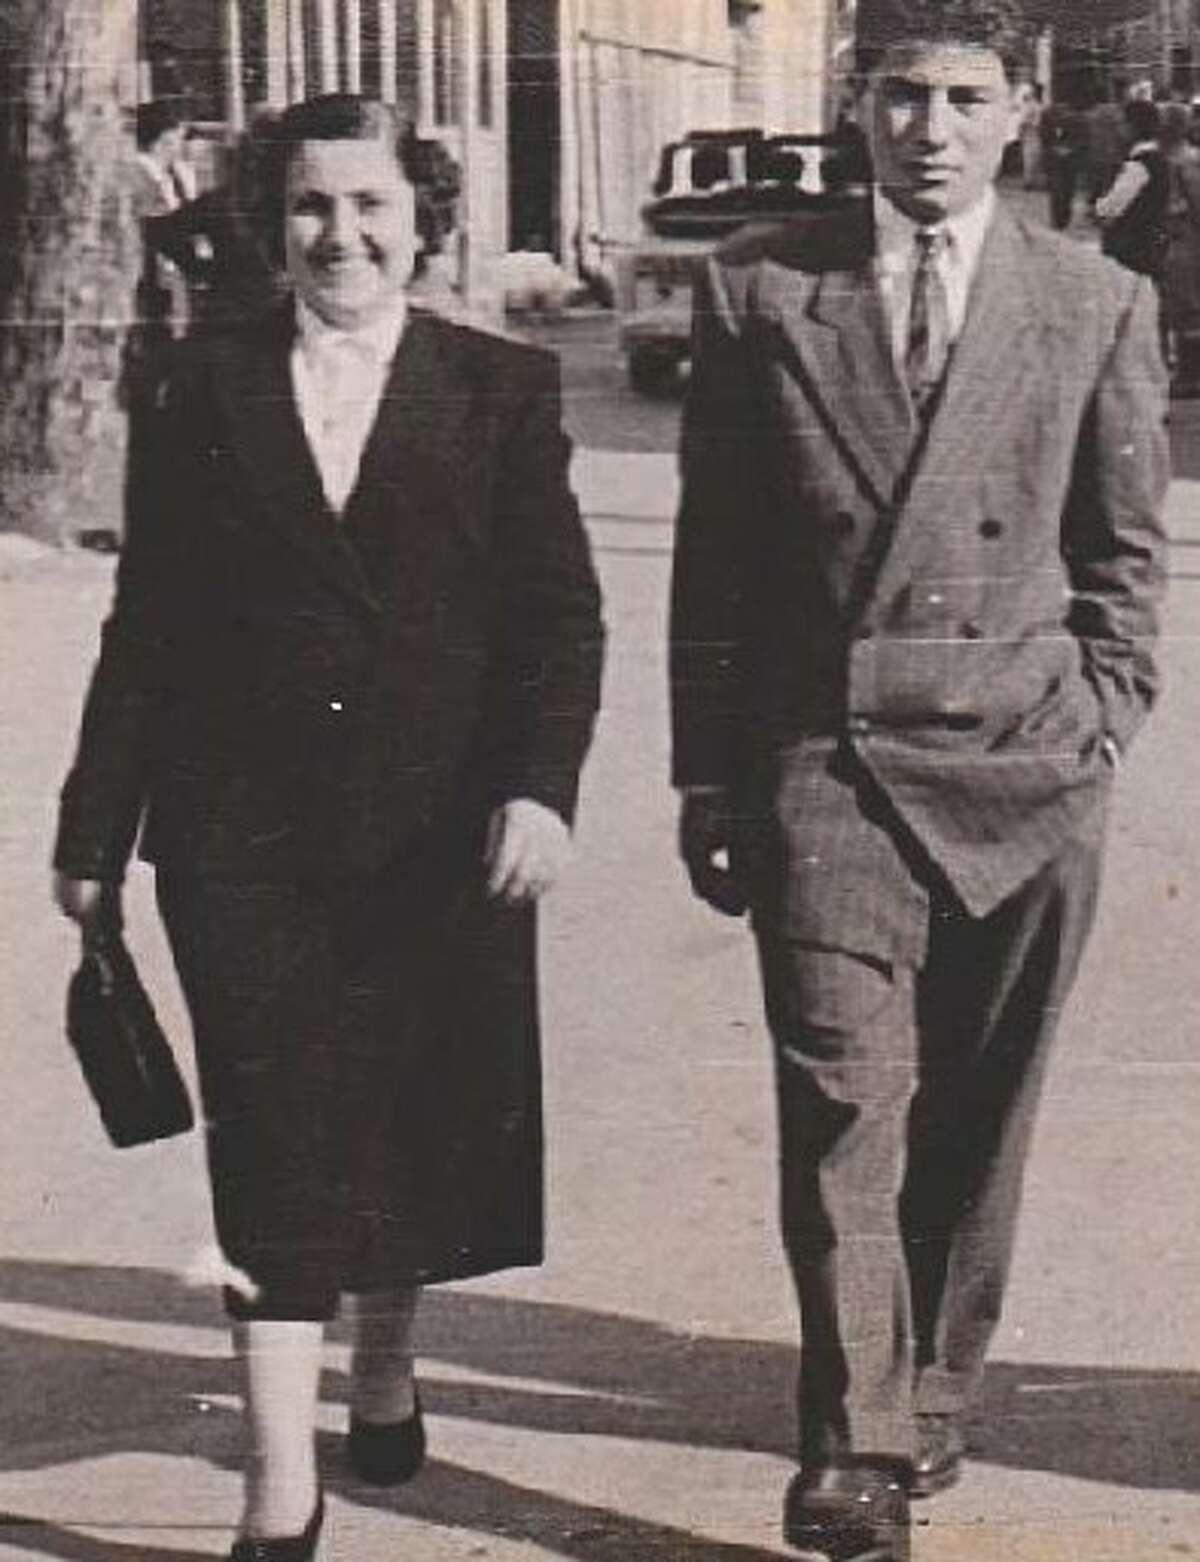 Nazha & John Kaddo were wed 70 years ago on Feb. 28, 1951 in Zghorta, Lebanon.